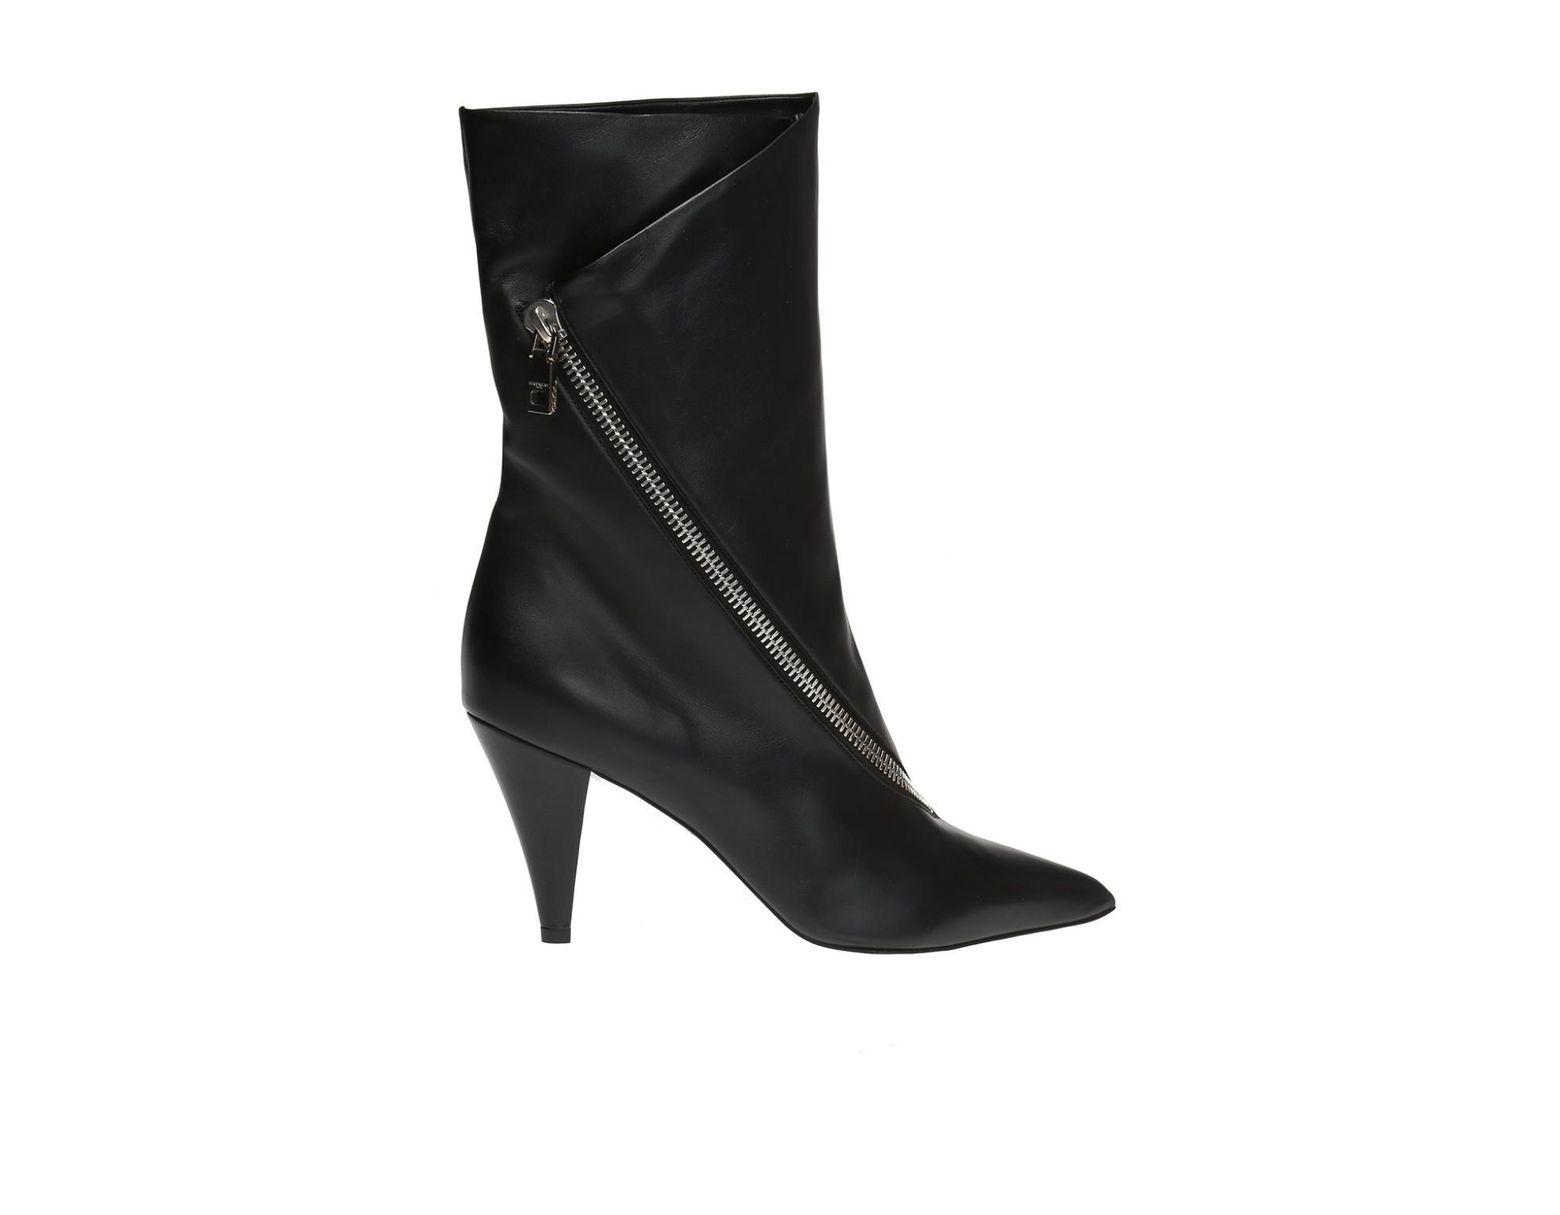 98998e4740d Women's Black Zip-detail 80 Leather Ankle Boots